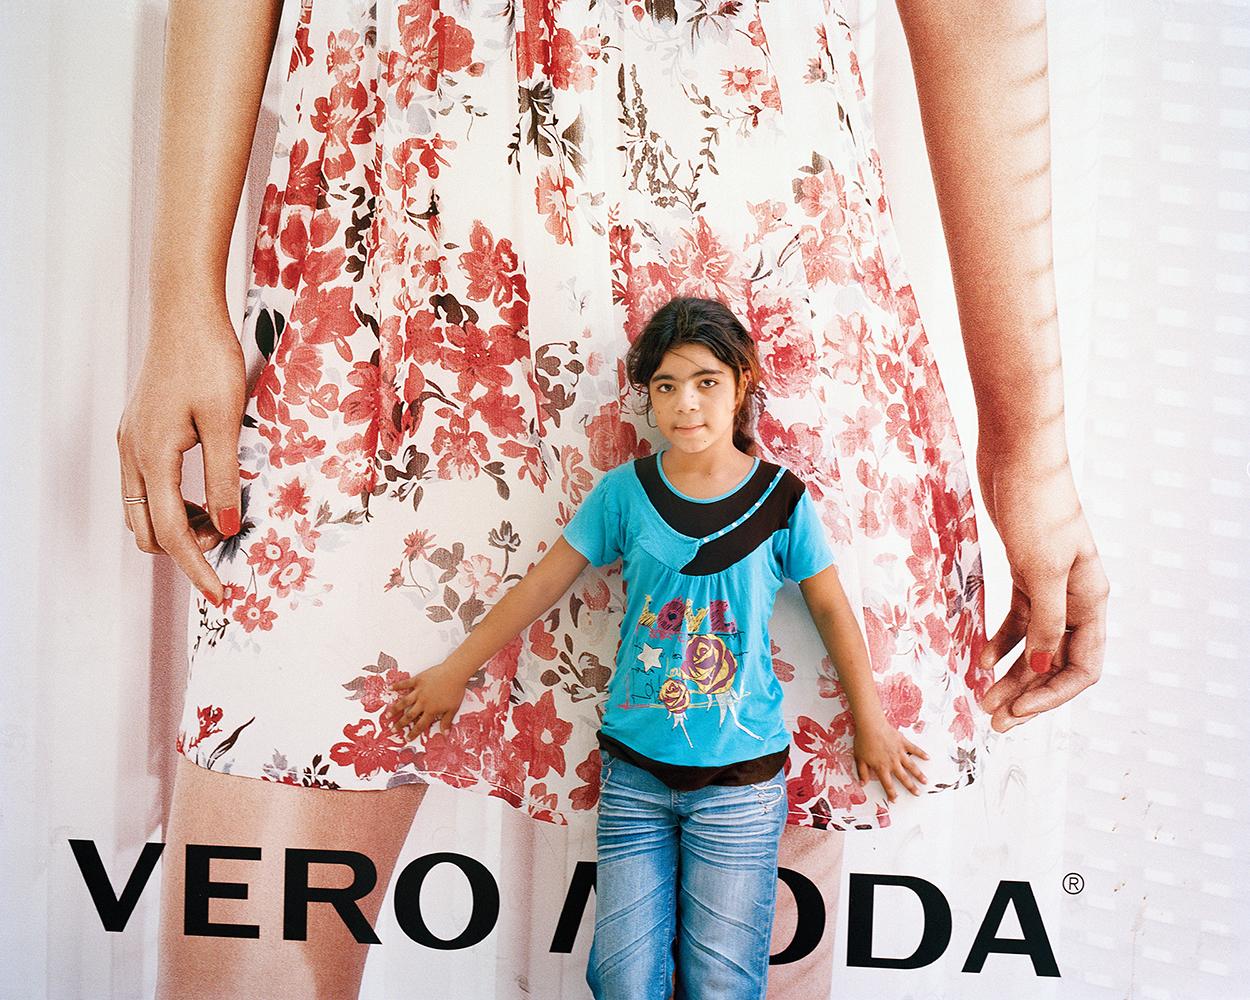 RANIA MATAR, Reem 11 - Vera Moda, Beirut, 2014